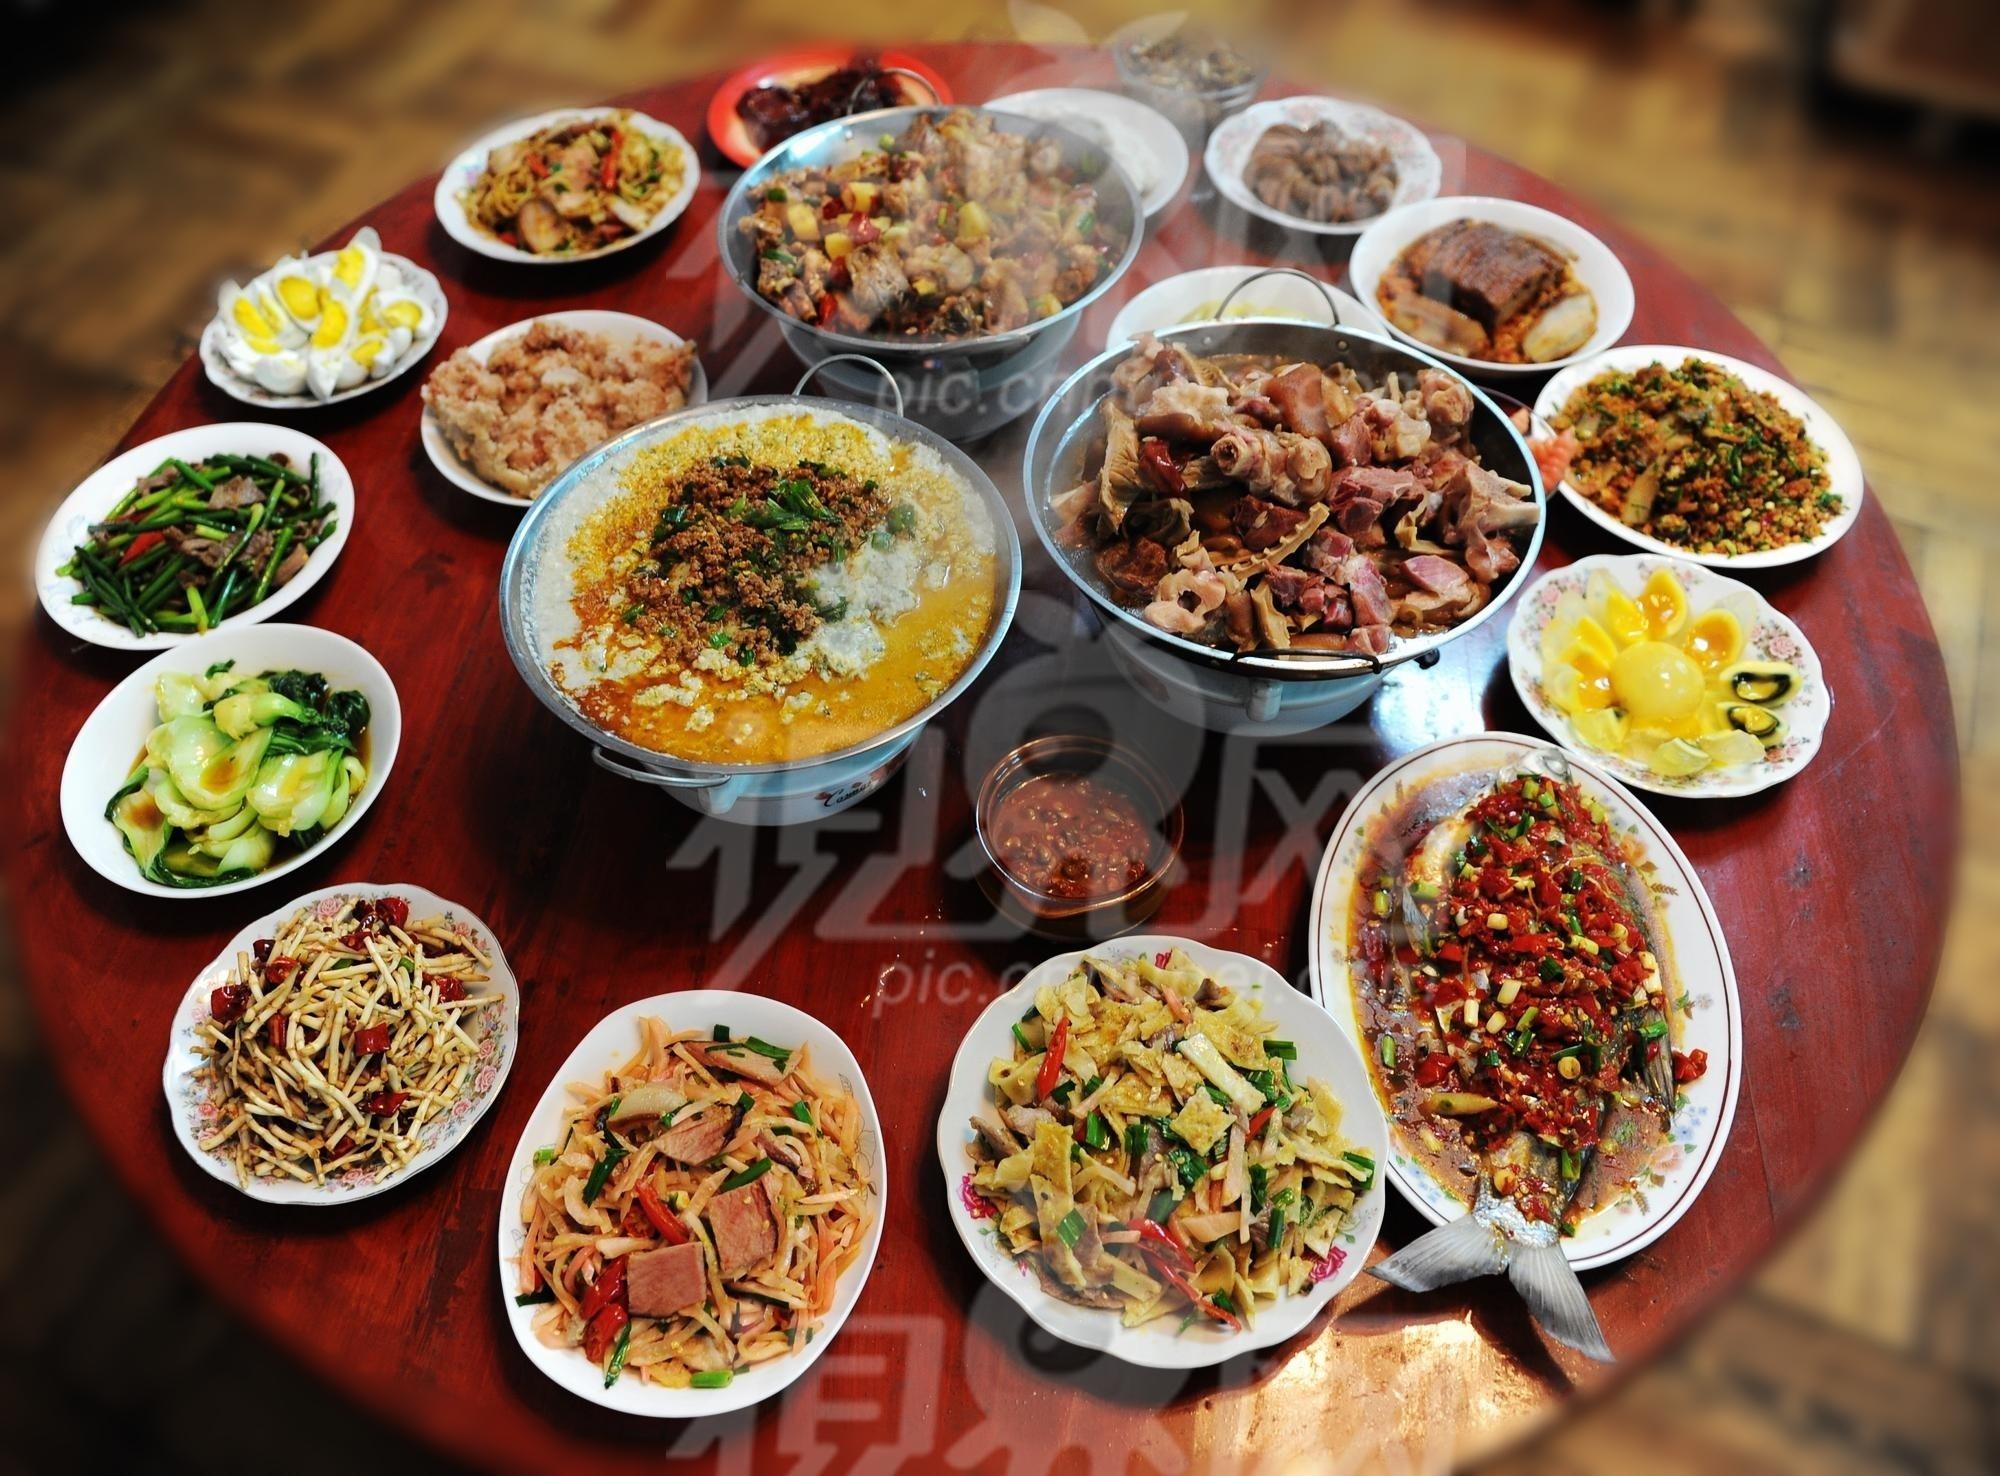 10 Lovely New Years Eve Dinner Menu Ideas feliz ano nuevo happy new year embrace culture diversity